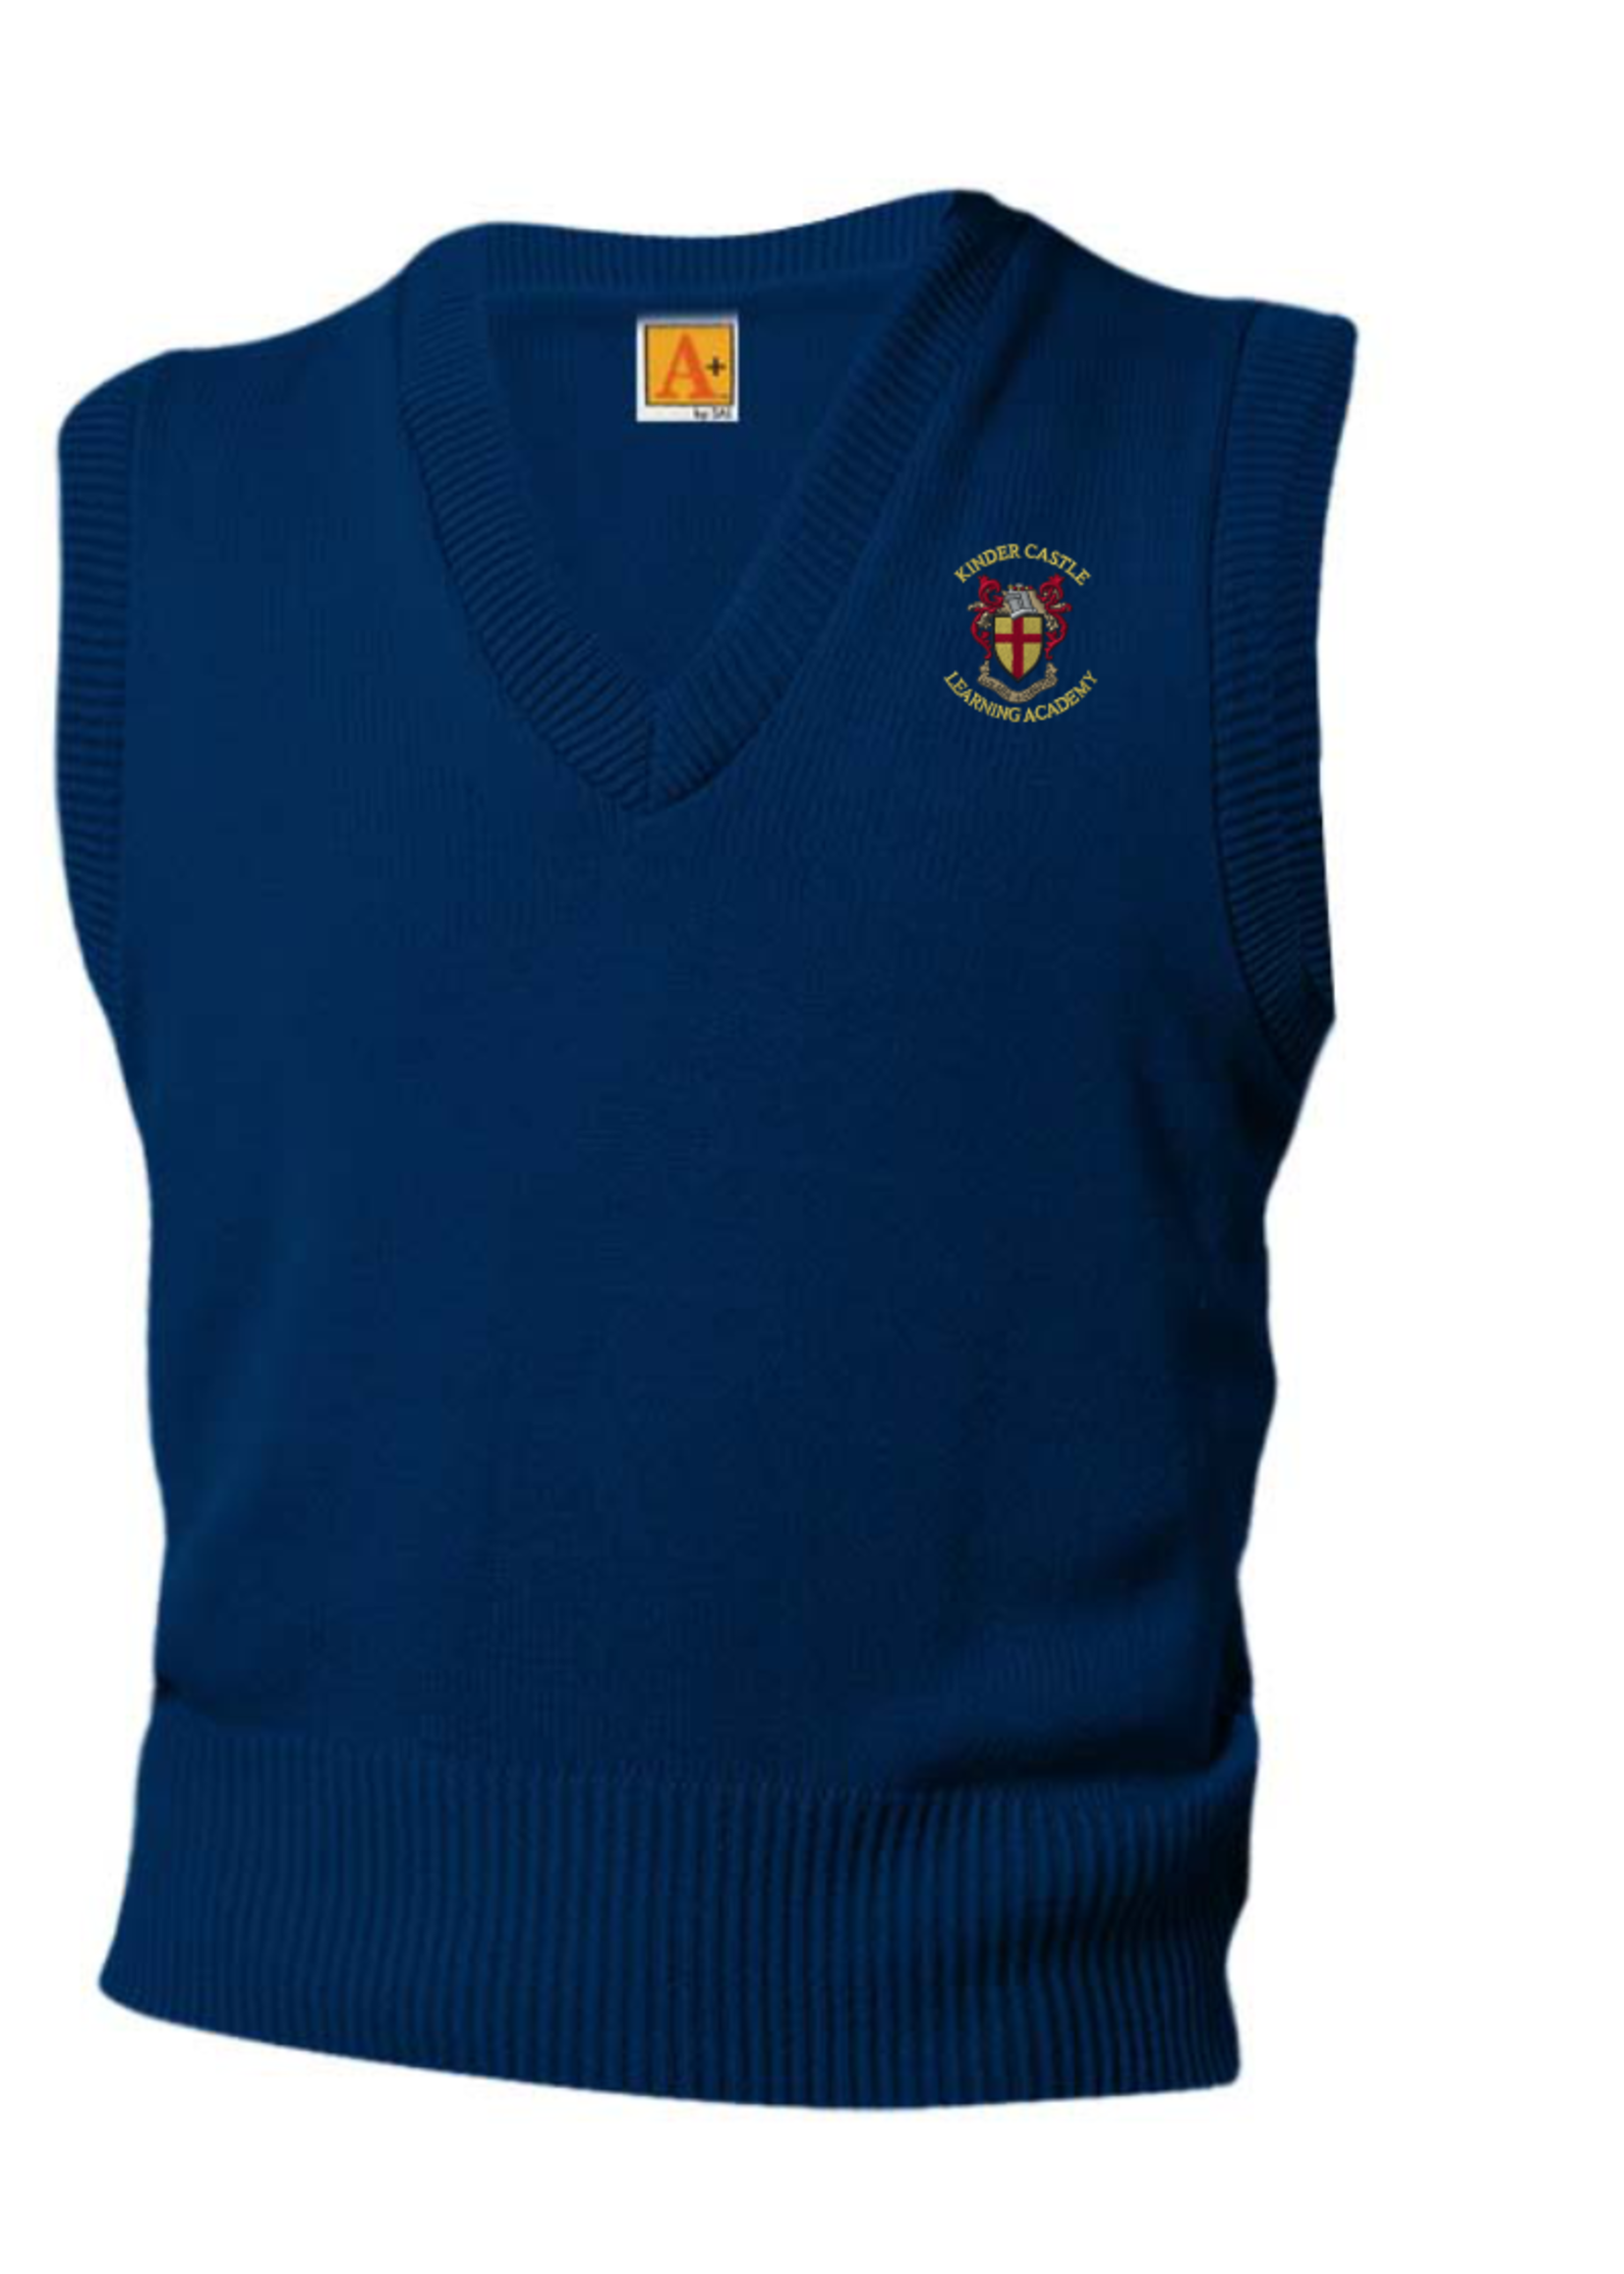 TUS KCLA Navy V-neck sweater vest